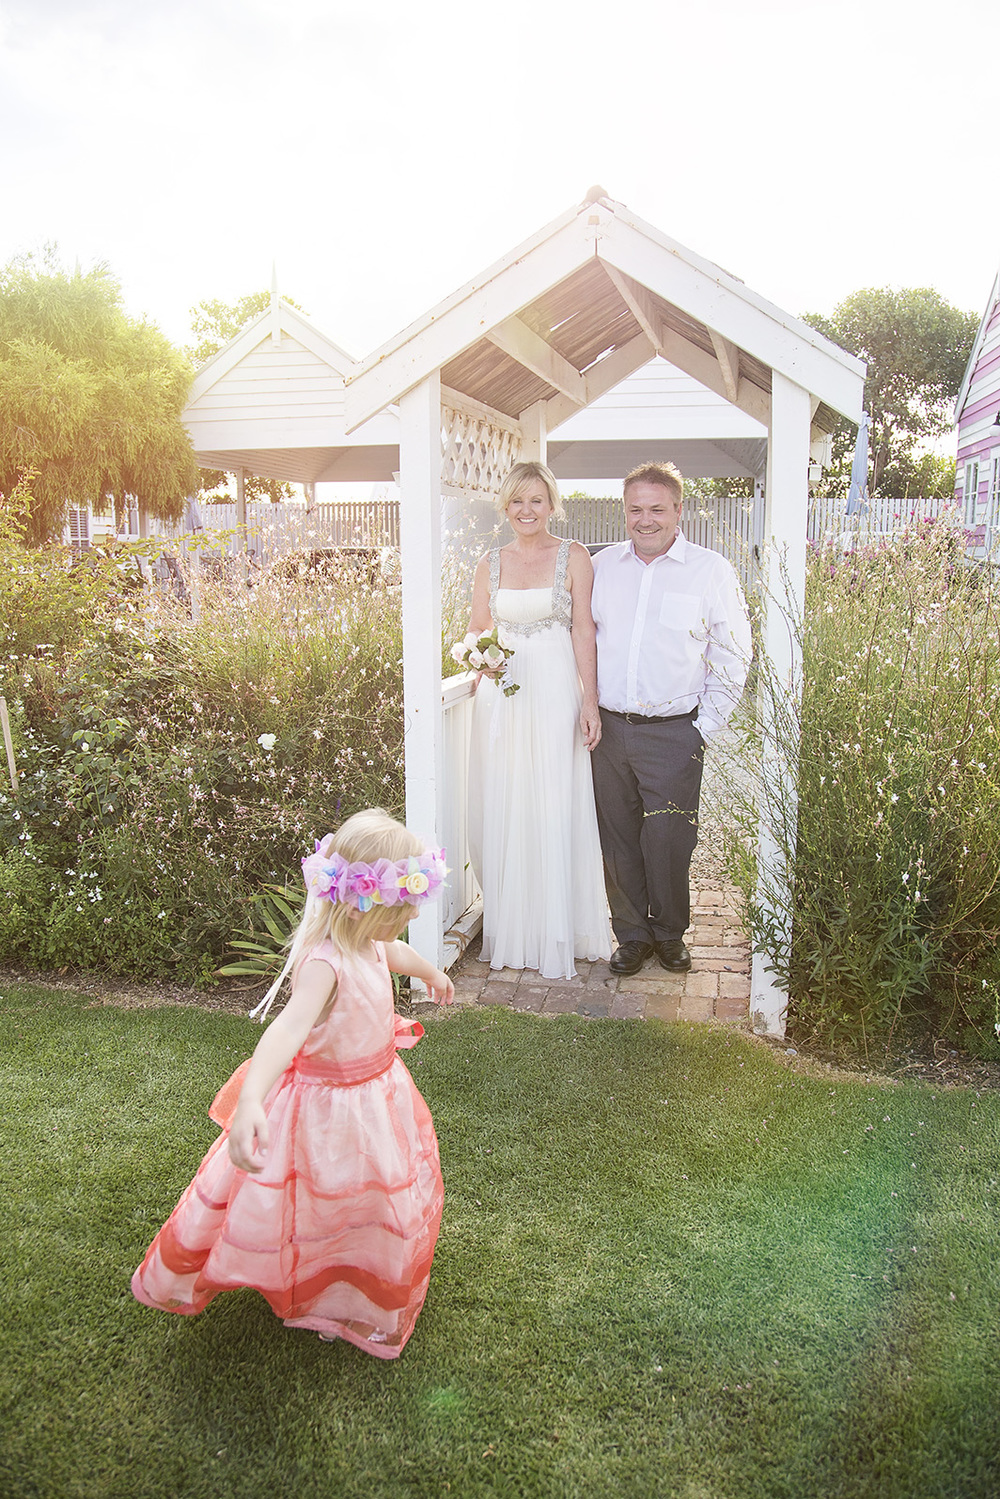 Middleton Beach Huts Wedding Photography South Australia 13.jpg